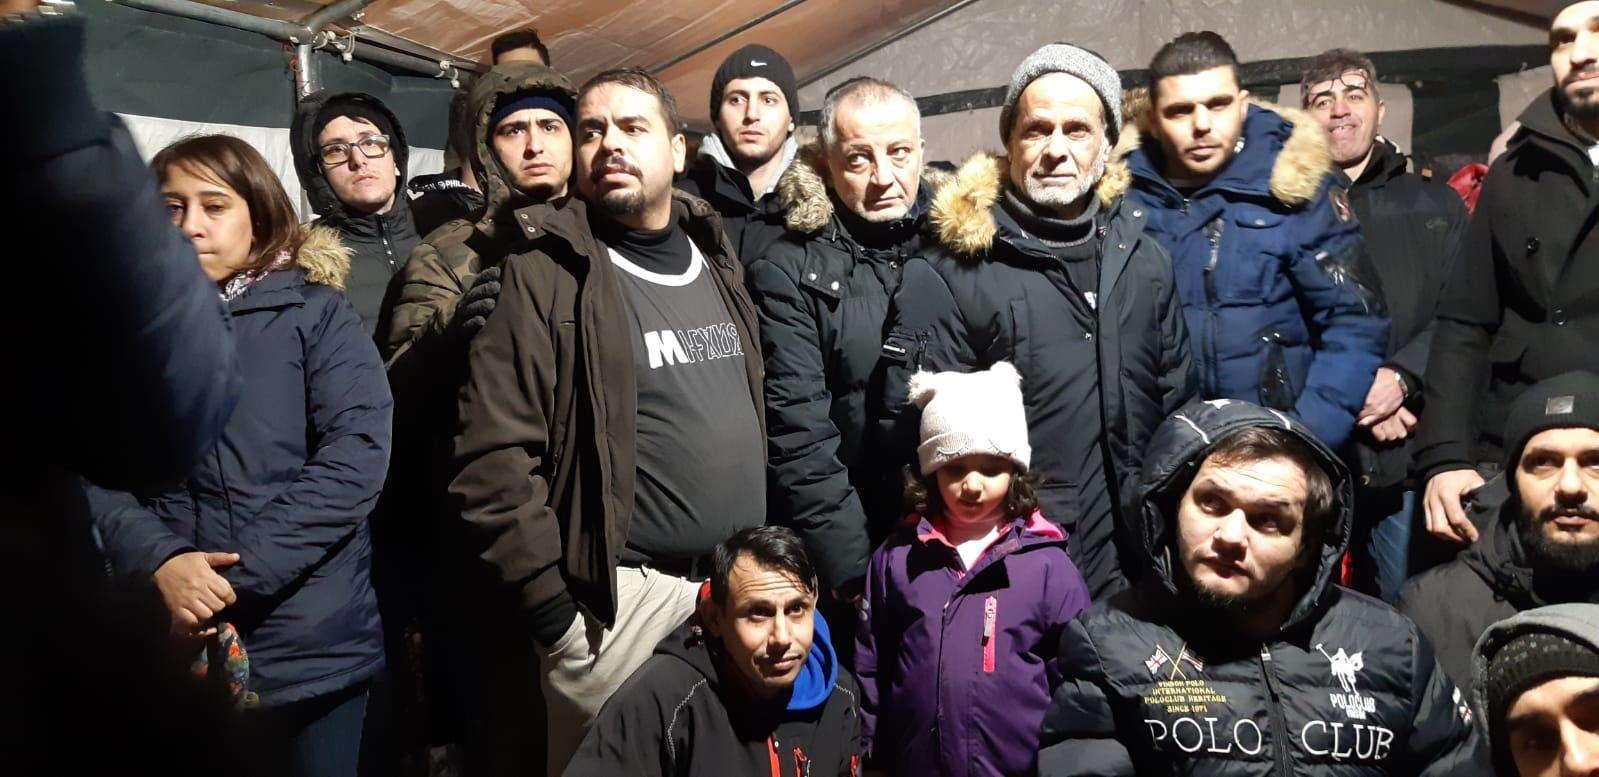 Sweden: 3,000 asylum seekers face abhorrent discriminatory measures